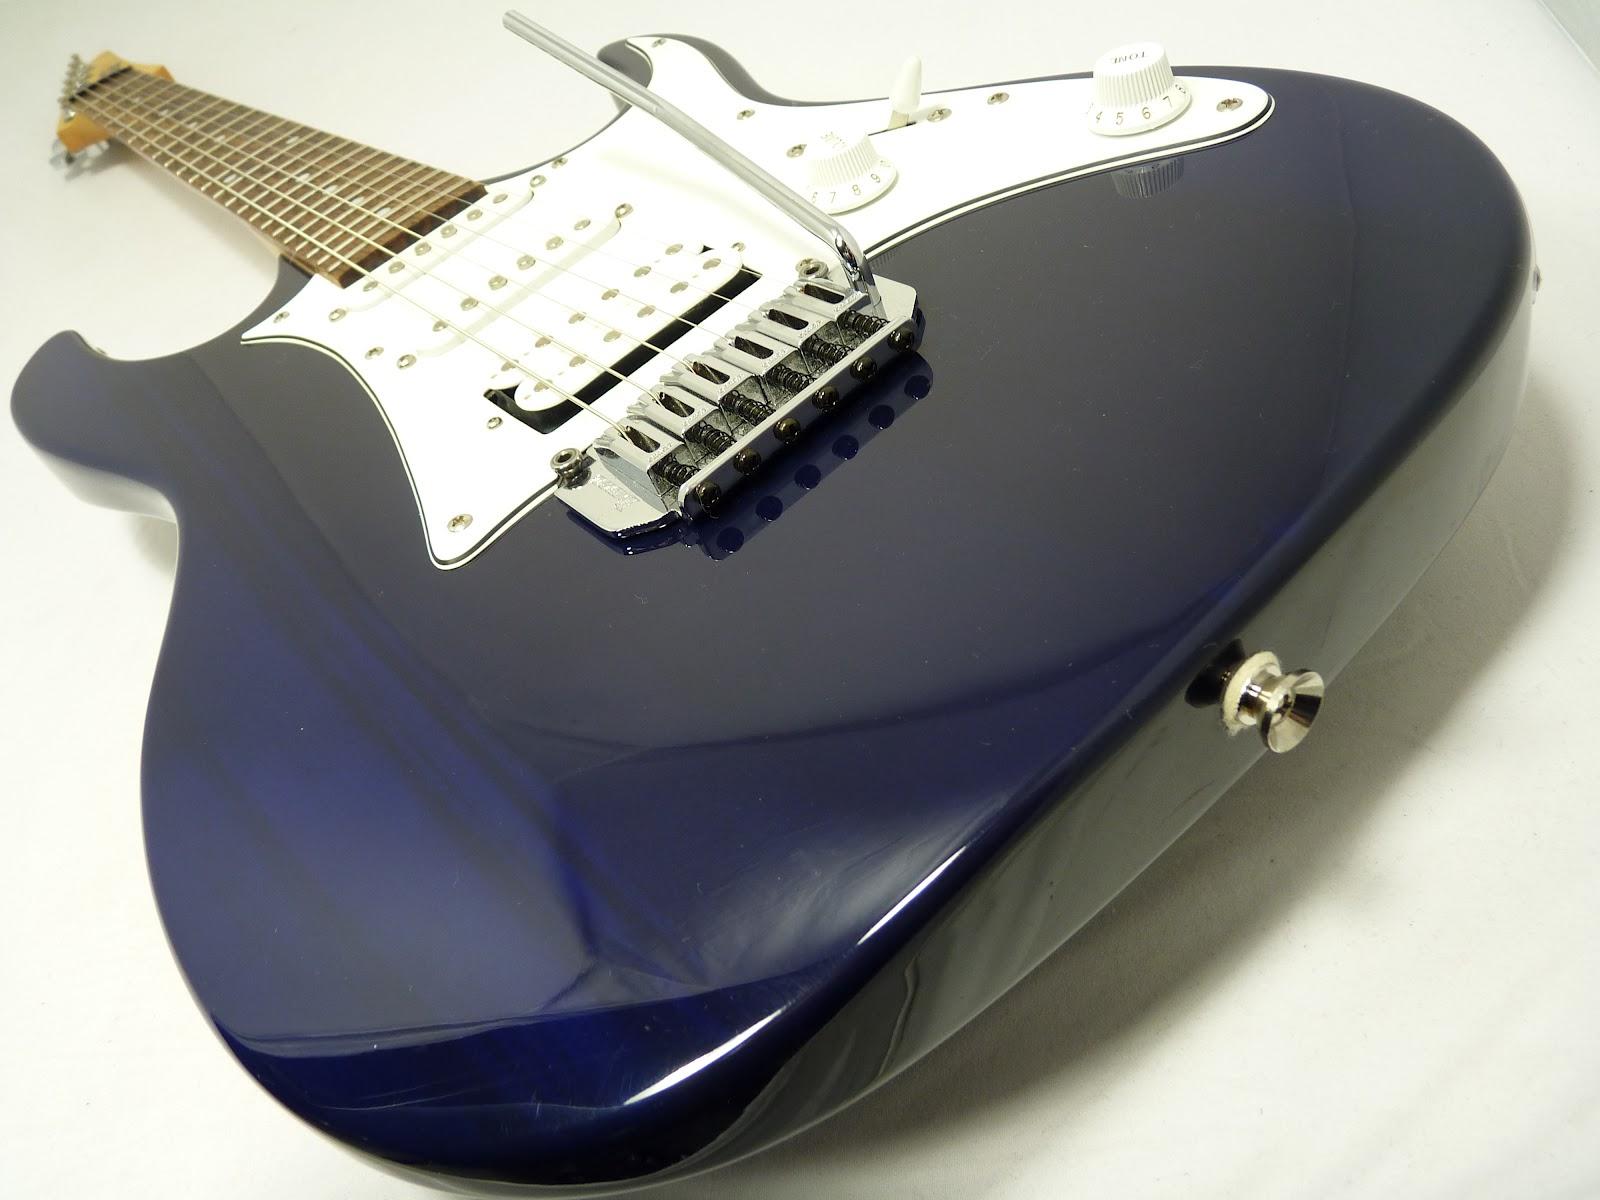 eBay Shop - Ibanez Gio GRX140 Electric Guitar, Blue - Second Hand ...